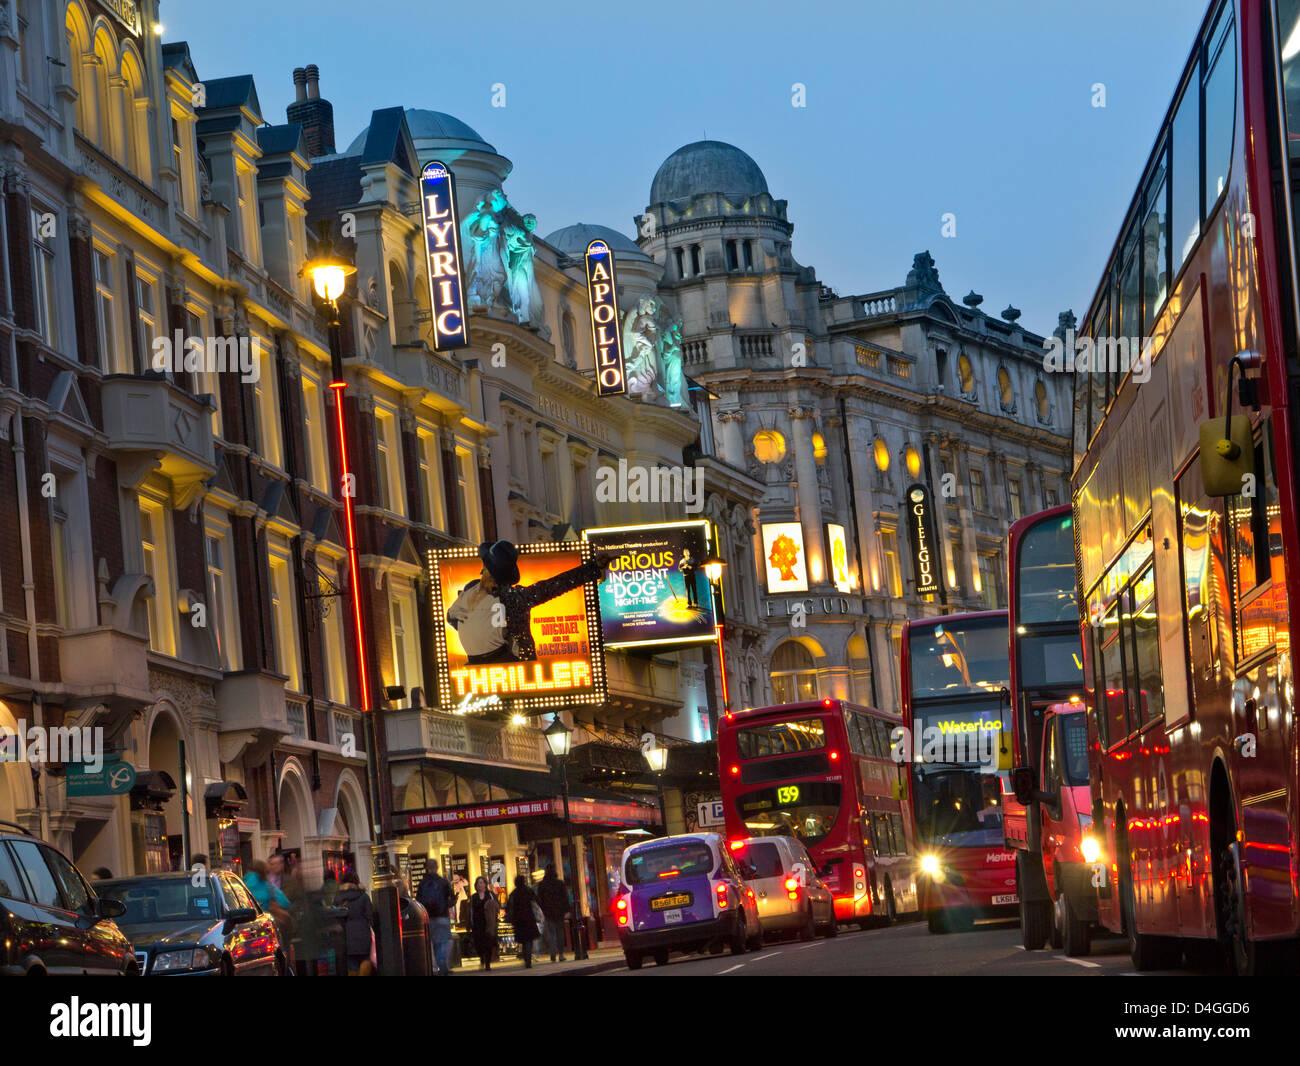 Hotels Shaftesbury Avenue Central London